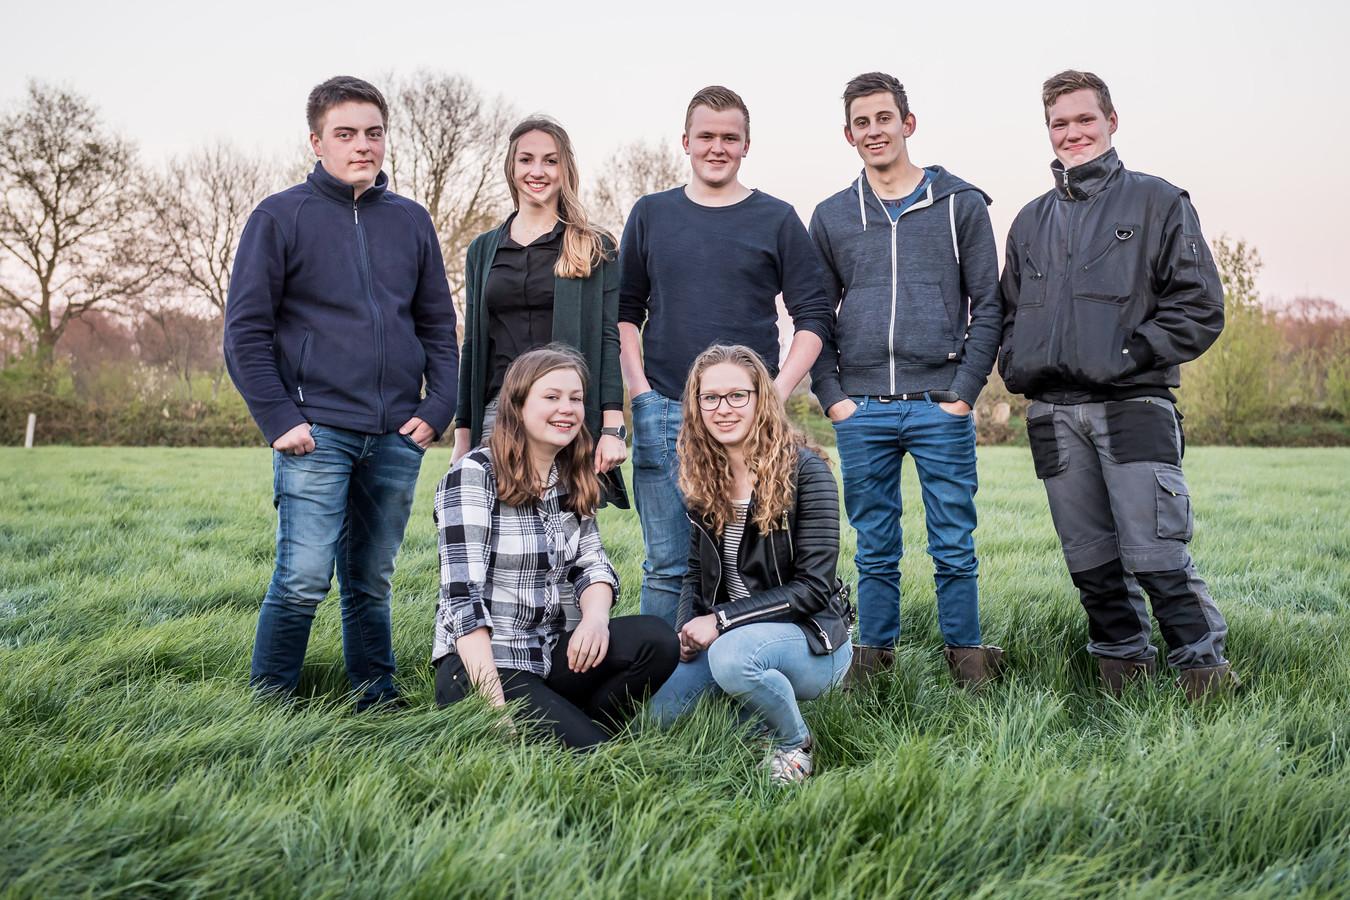 De vriendengroep uit de documentaire Brommers Kiek'n.